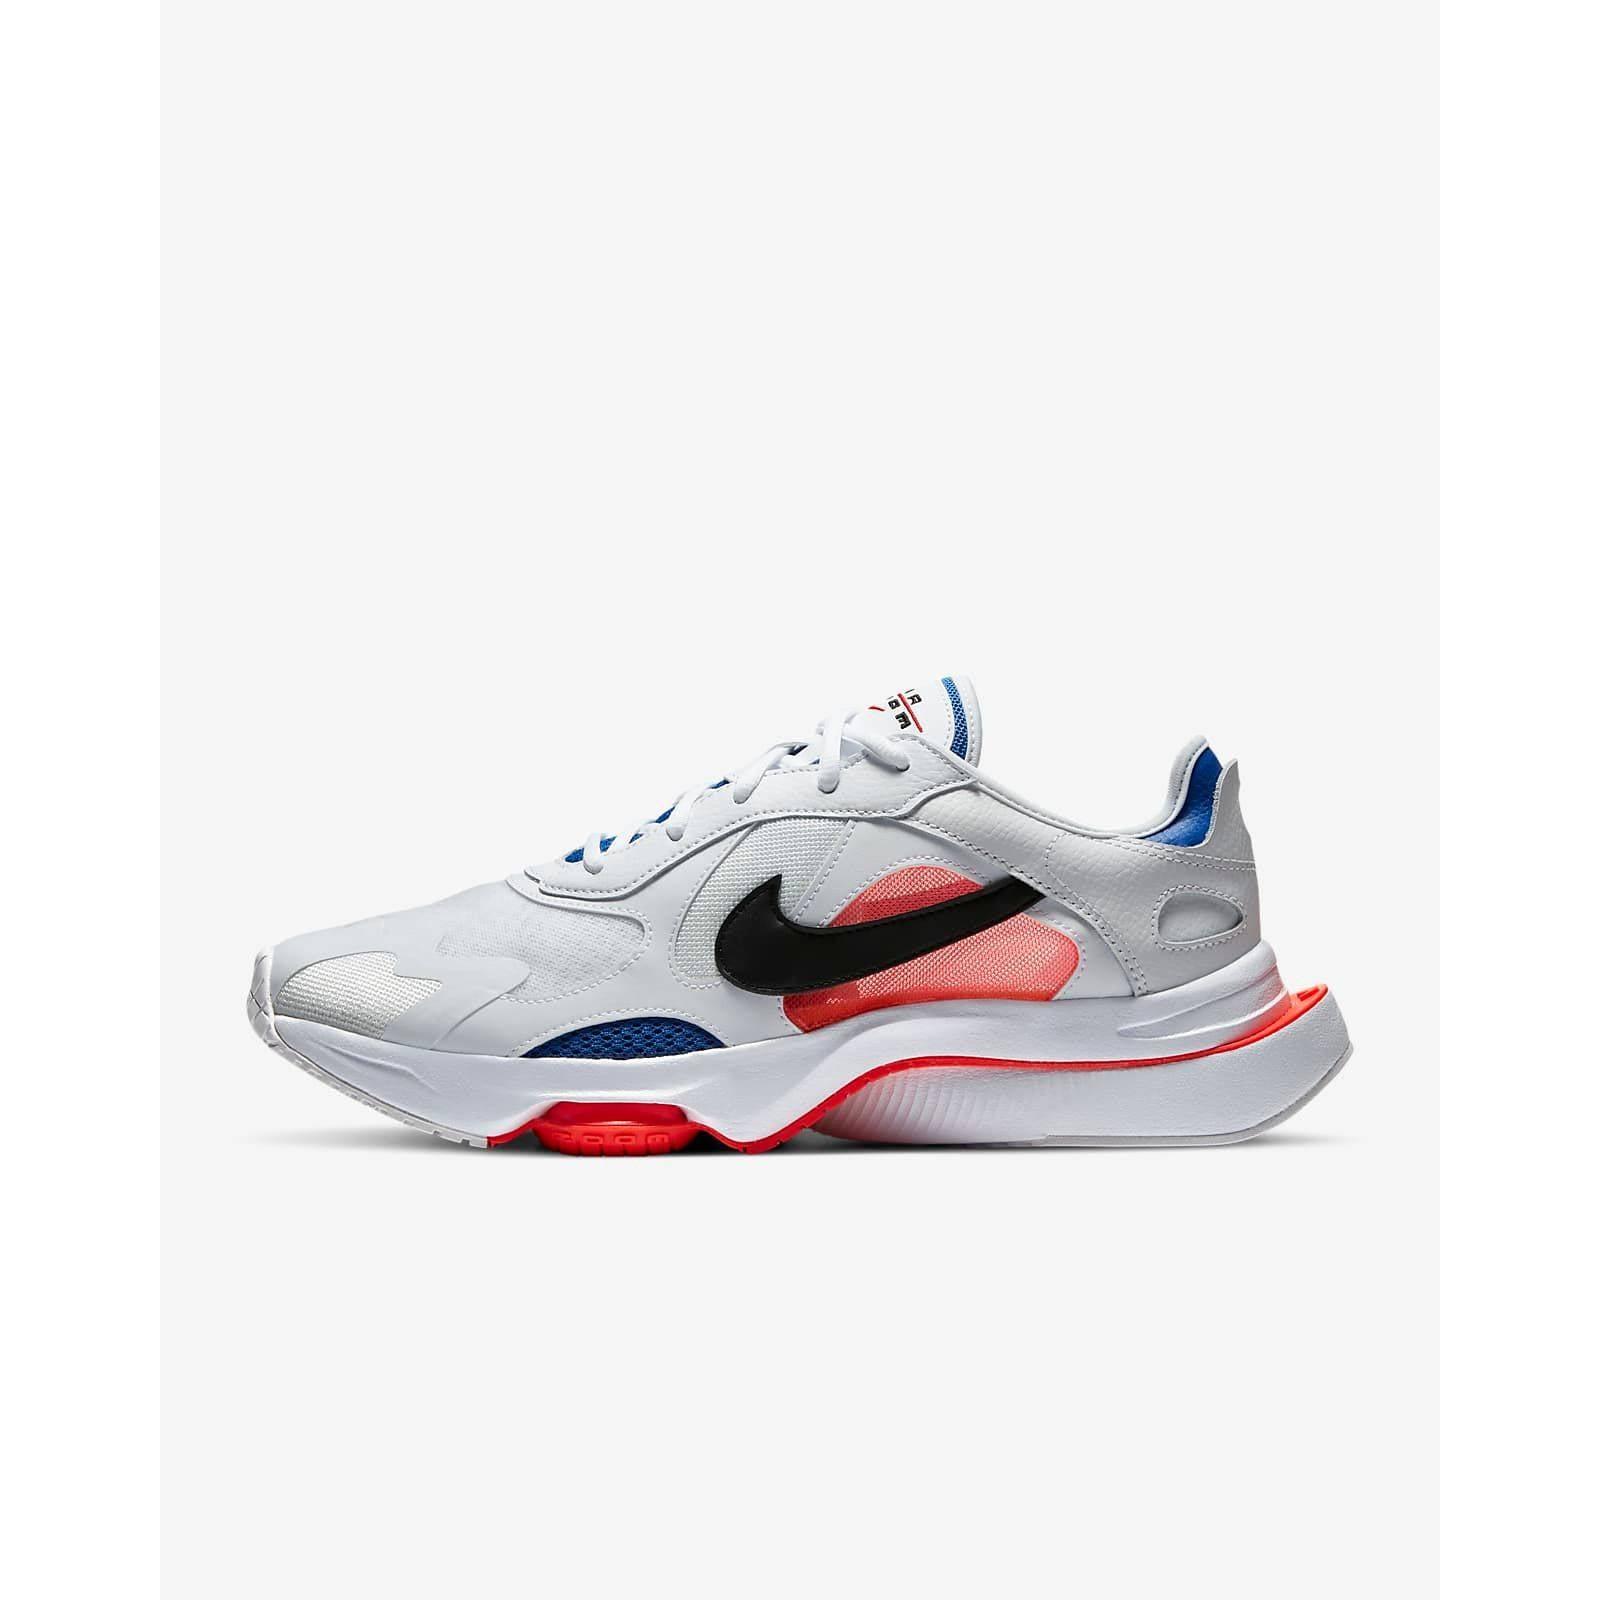 Men's Nike Air Zoom Shoes Sneakers 11